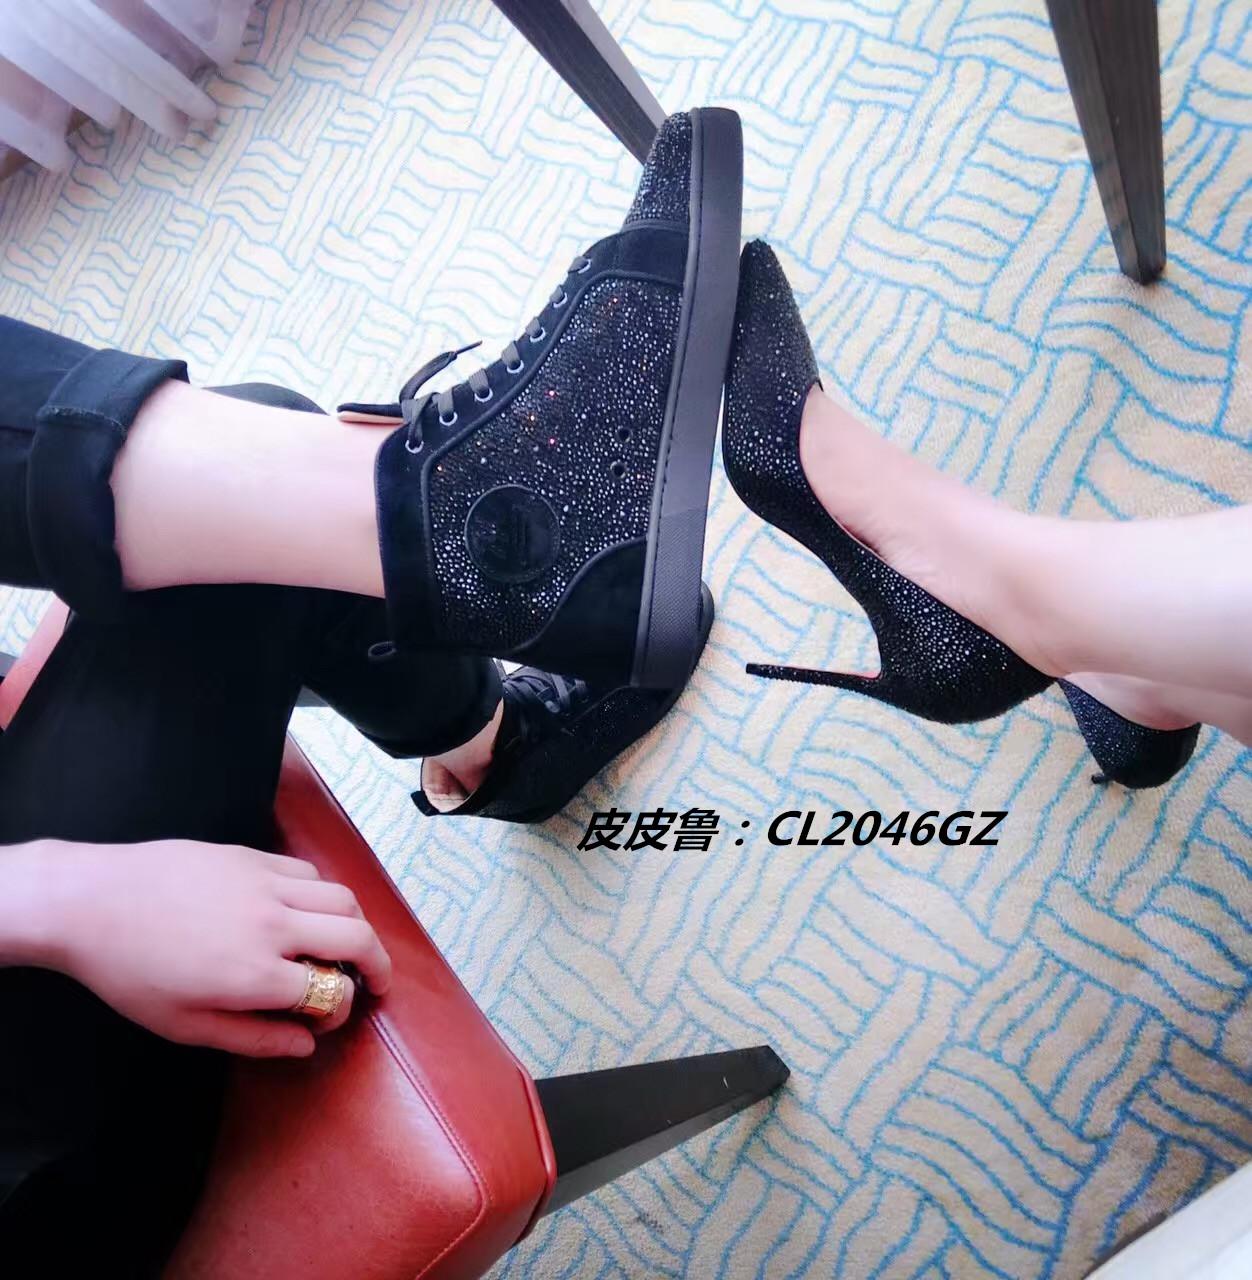 CL经典黑麂皮水钻高帮鞋18-GZ情侣款男鞋女鞋红底休闲鞋板鞋短靴